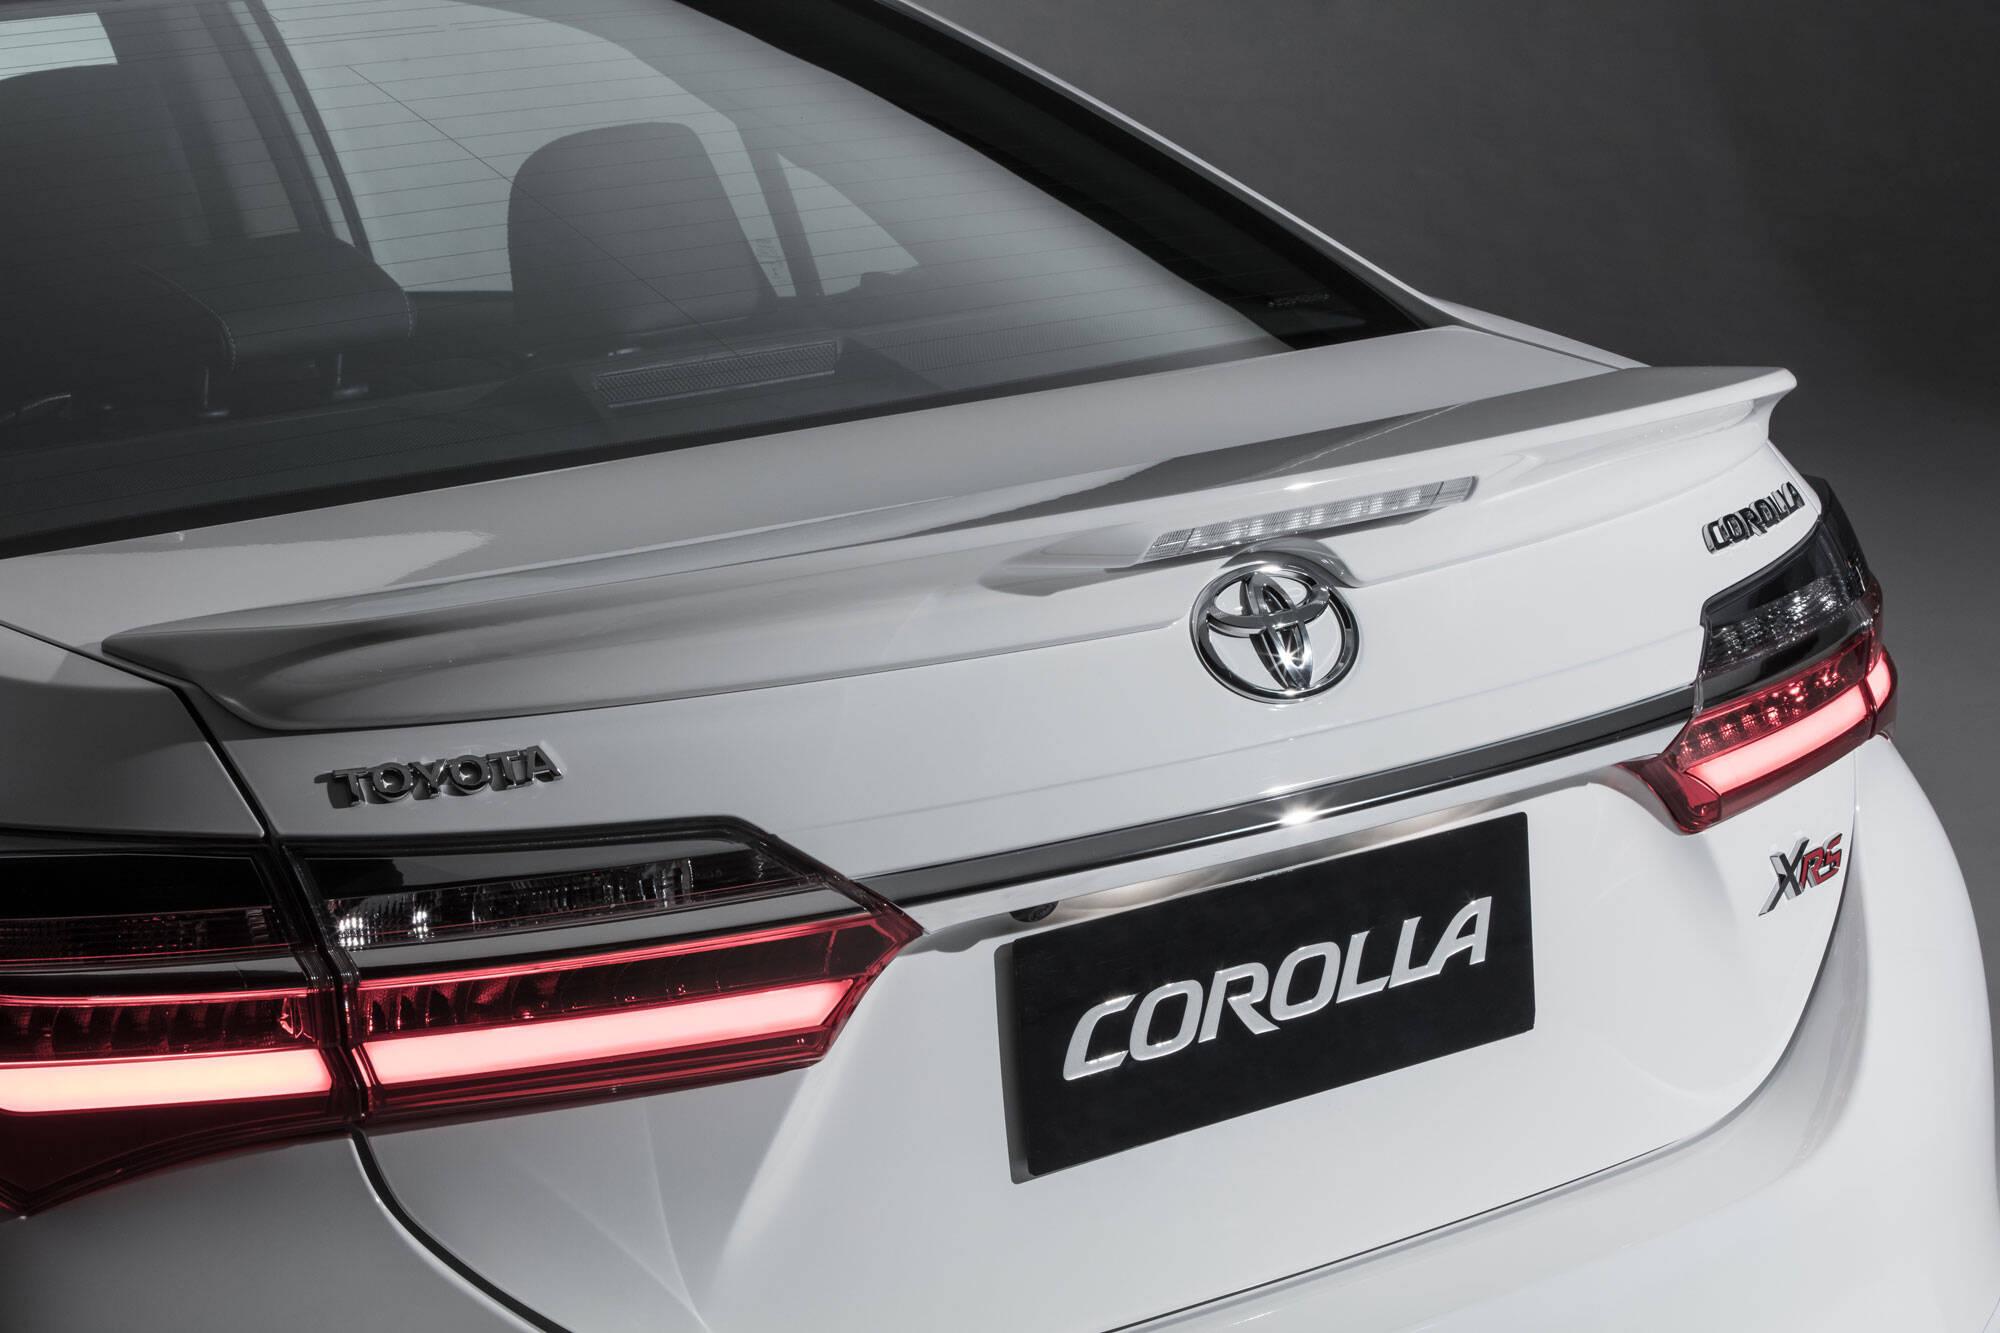 Toyota Corolla XRS. Foto: Divulgação/Toyota